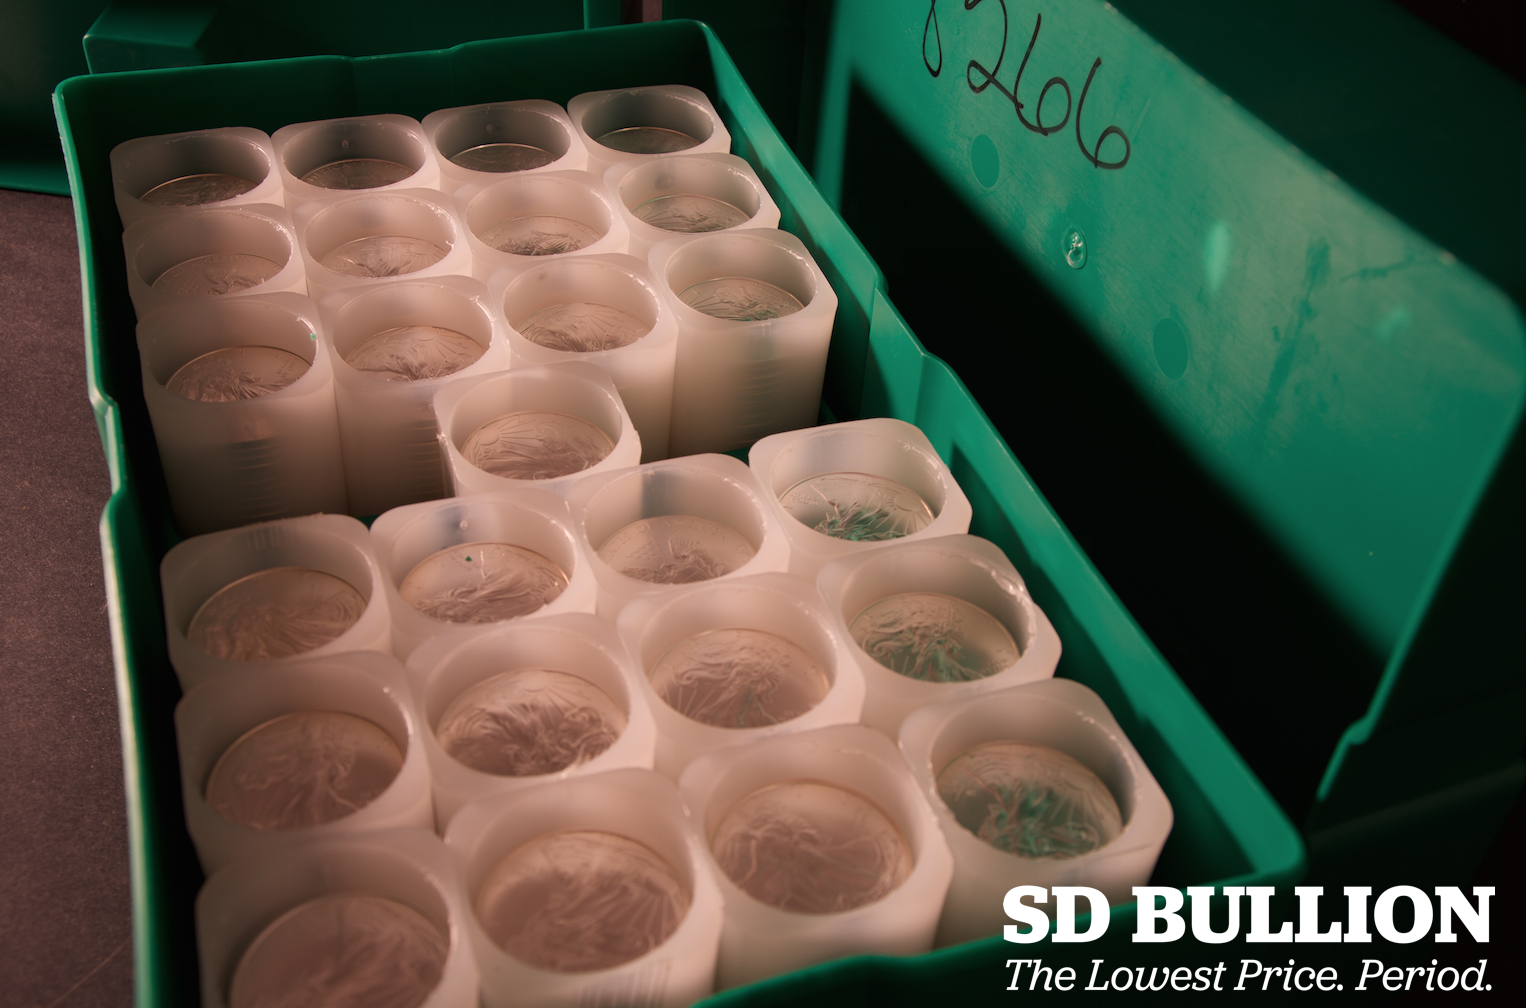 US Mint Case monster box interior Mint Tubes Open Silver Eagle Coins SD Bullion SDBullion.com